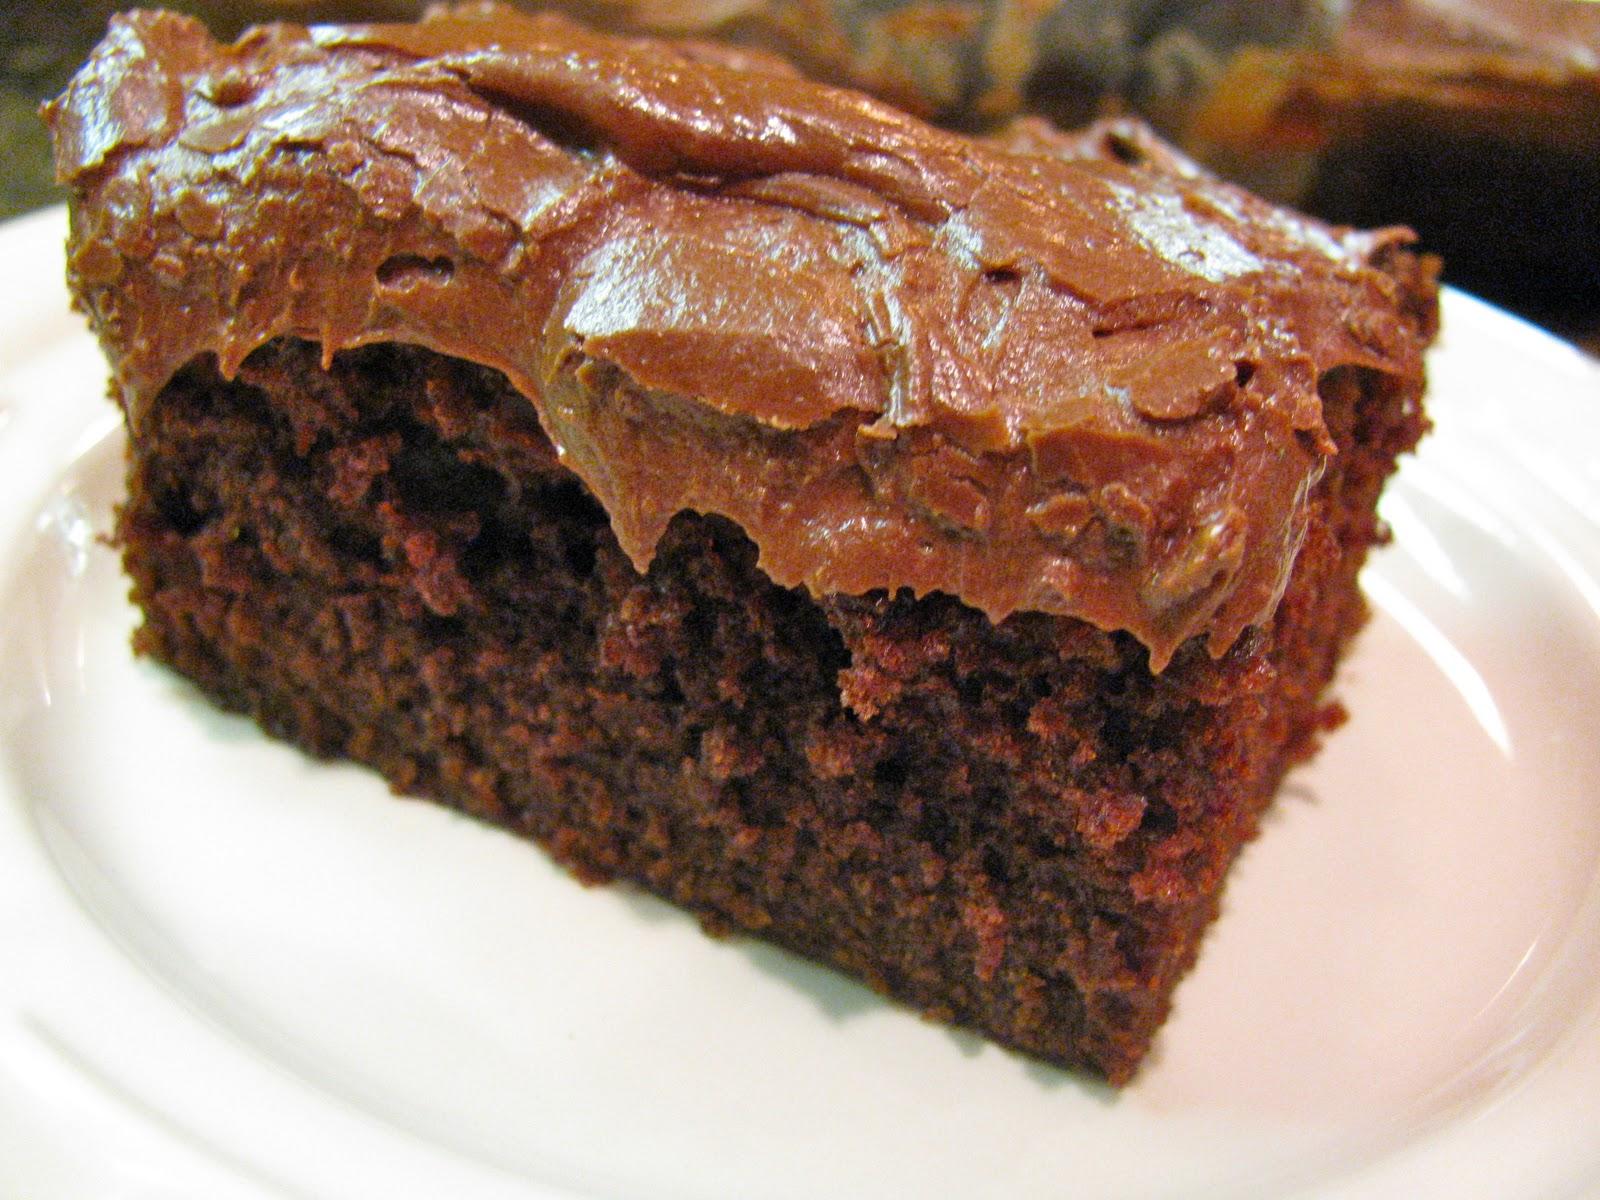 Rita's Recipes: Perfectly Chocolate Cake